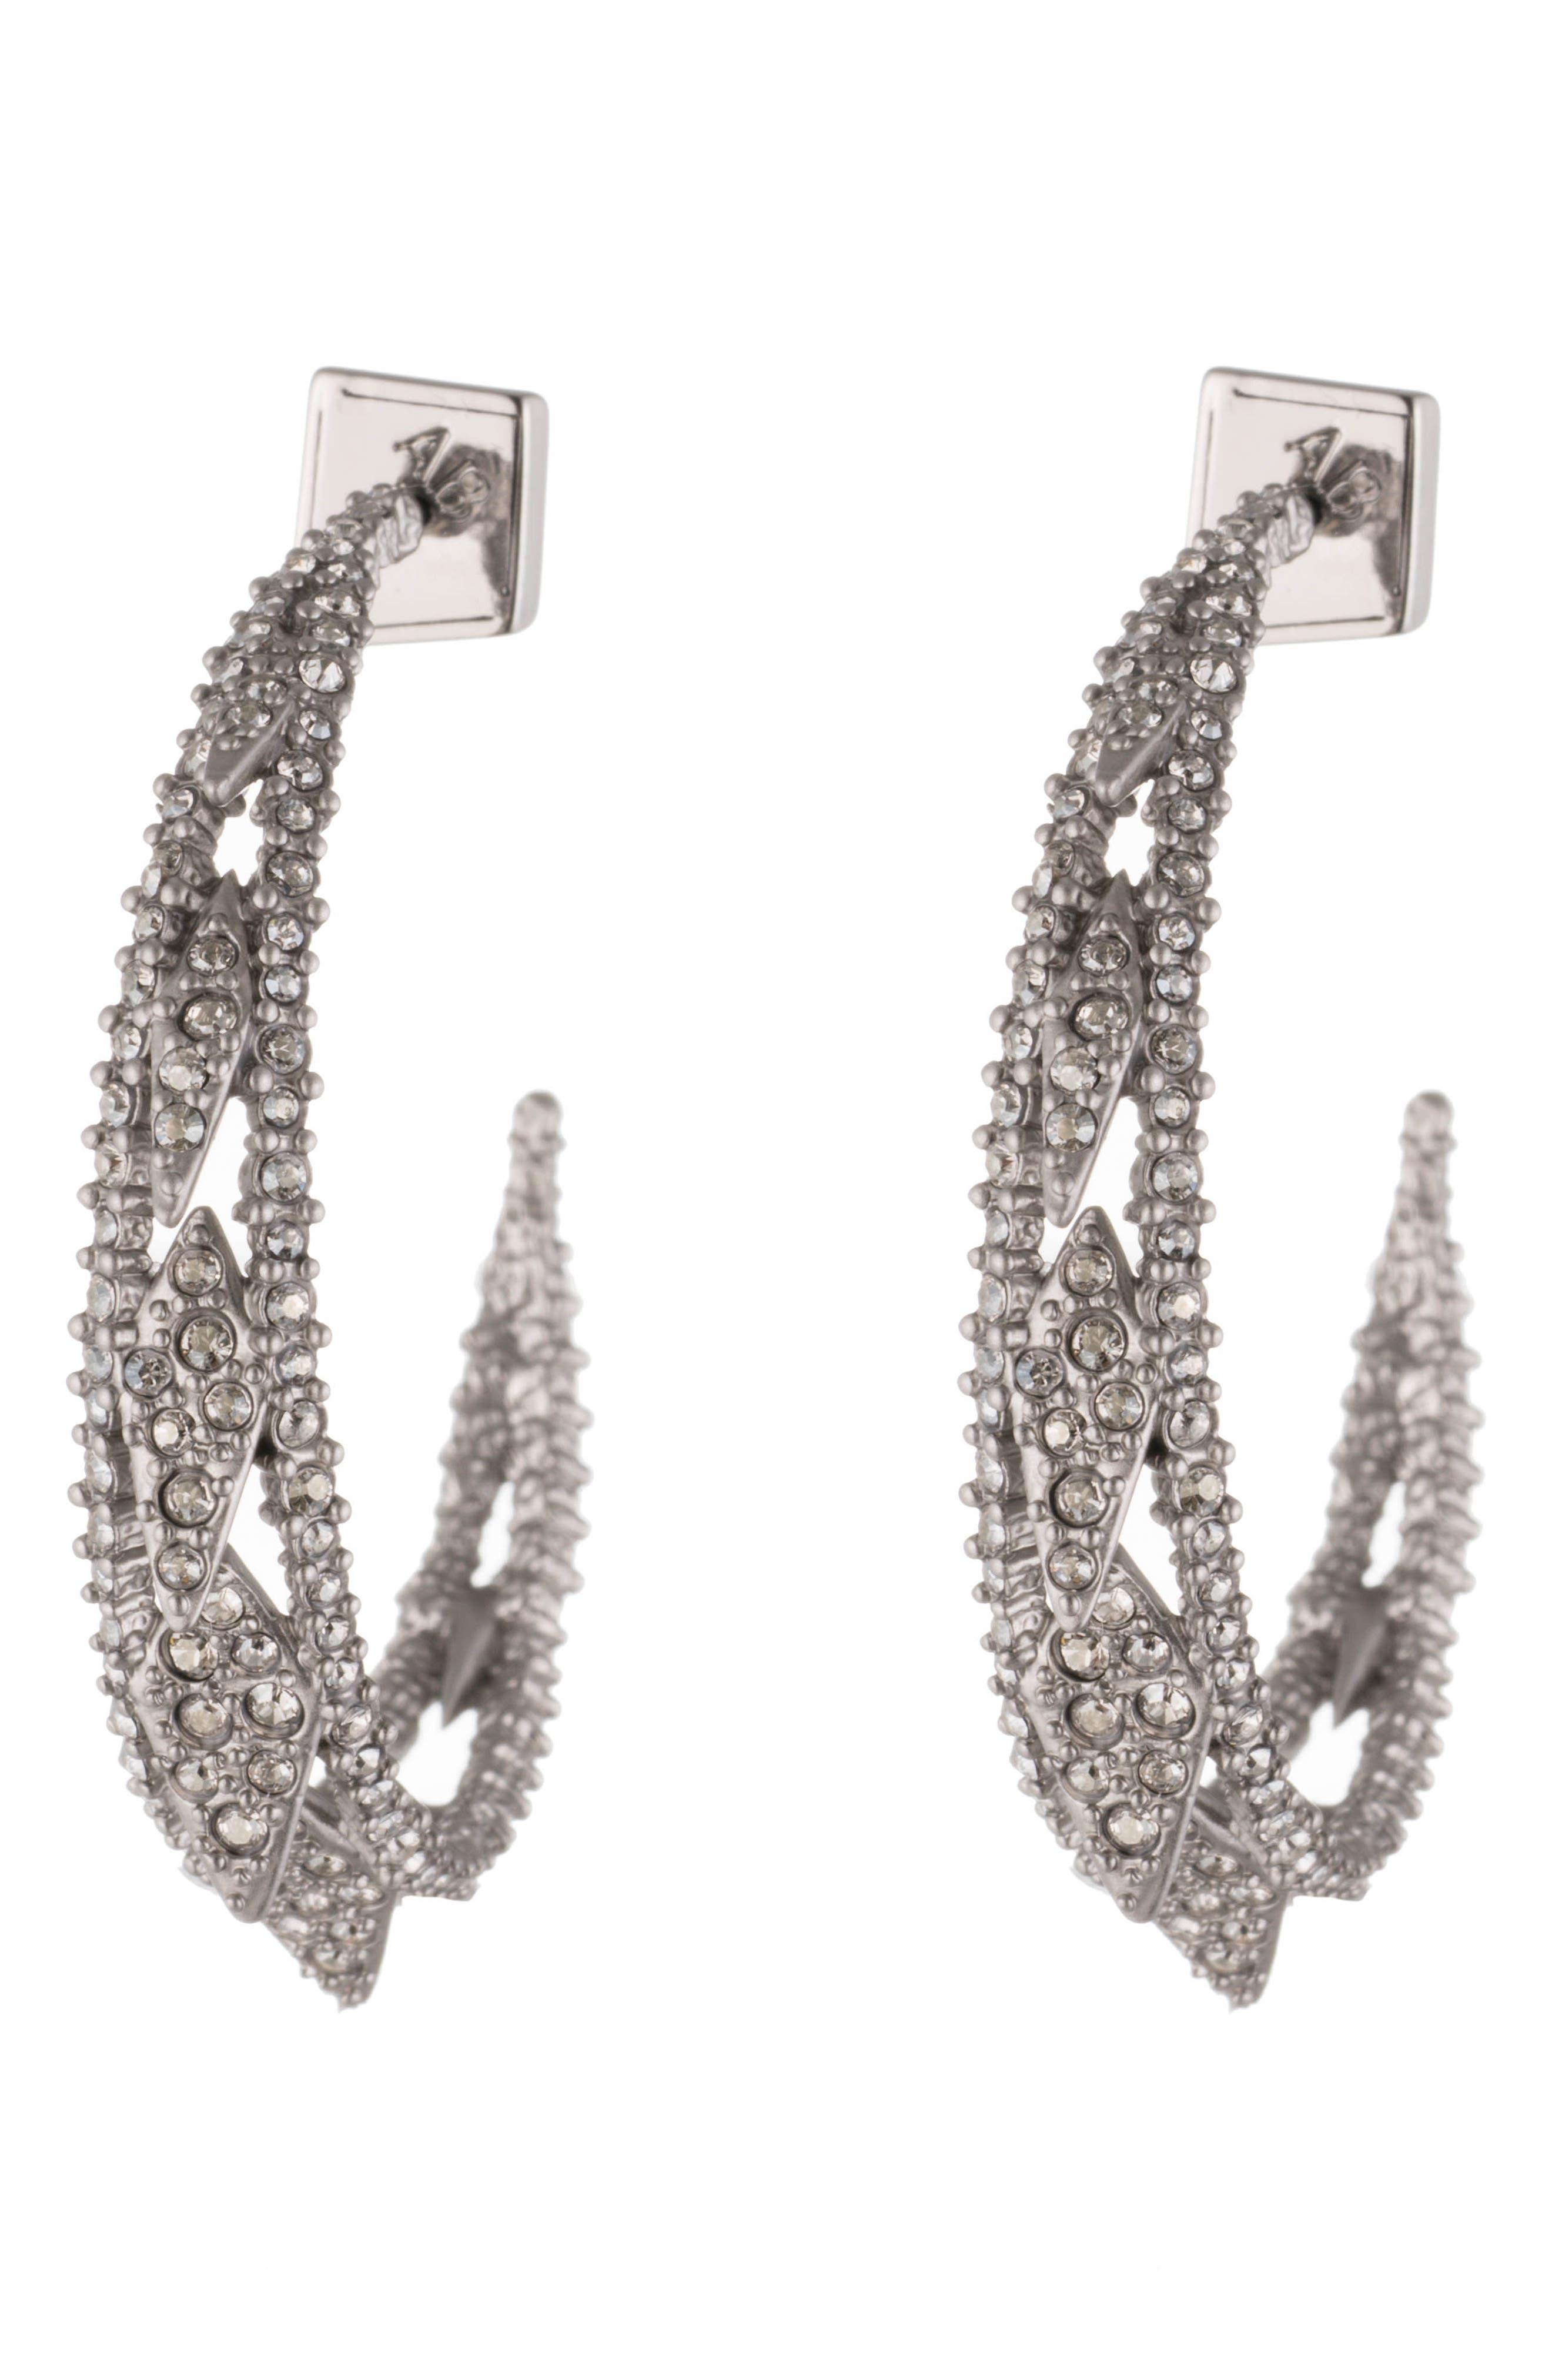 Crystal Encrusted Hook Earrings,                             Main thumbnail 1, color,                             040